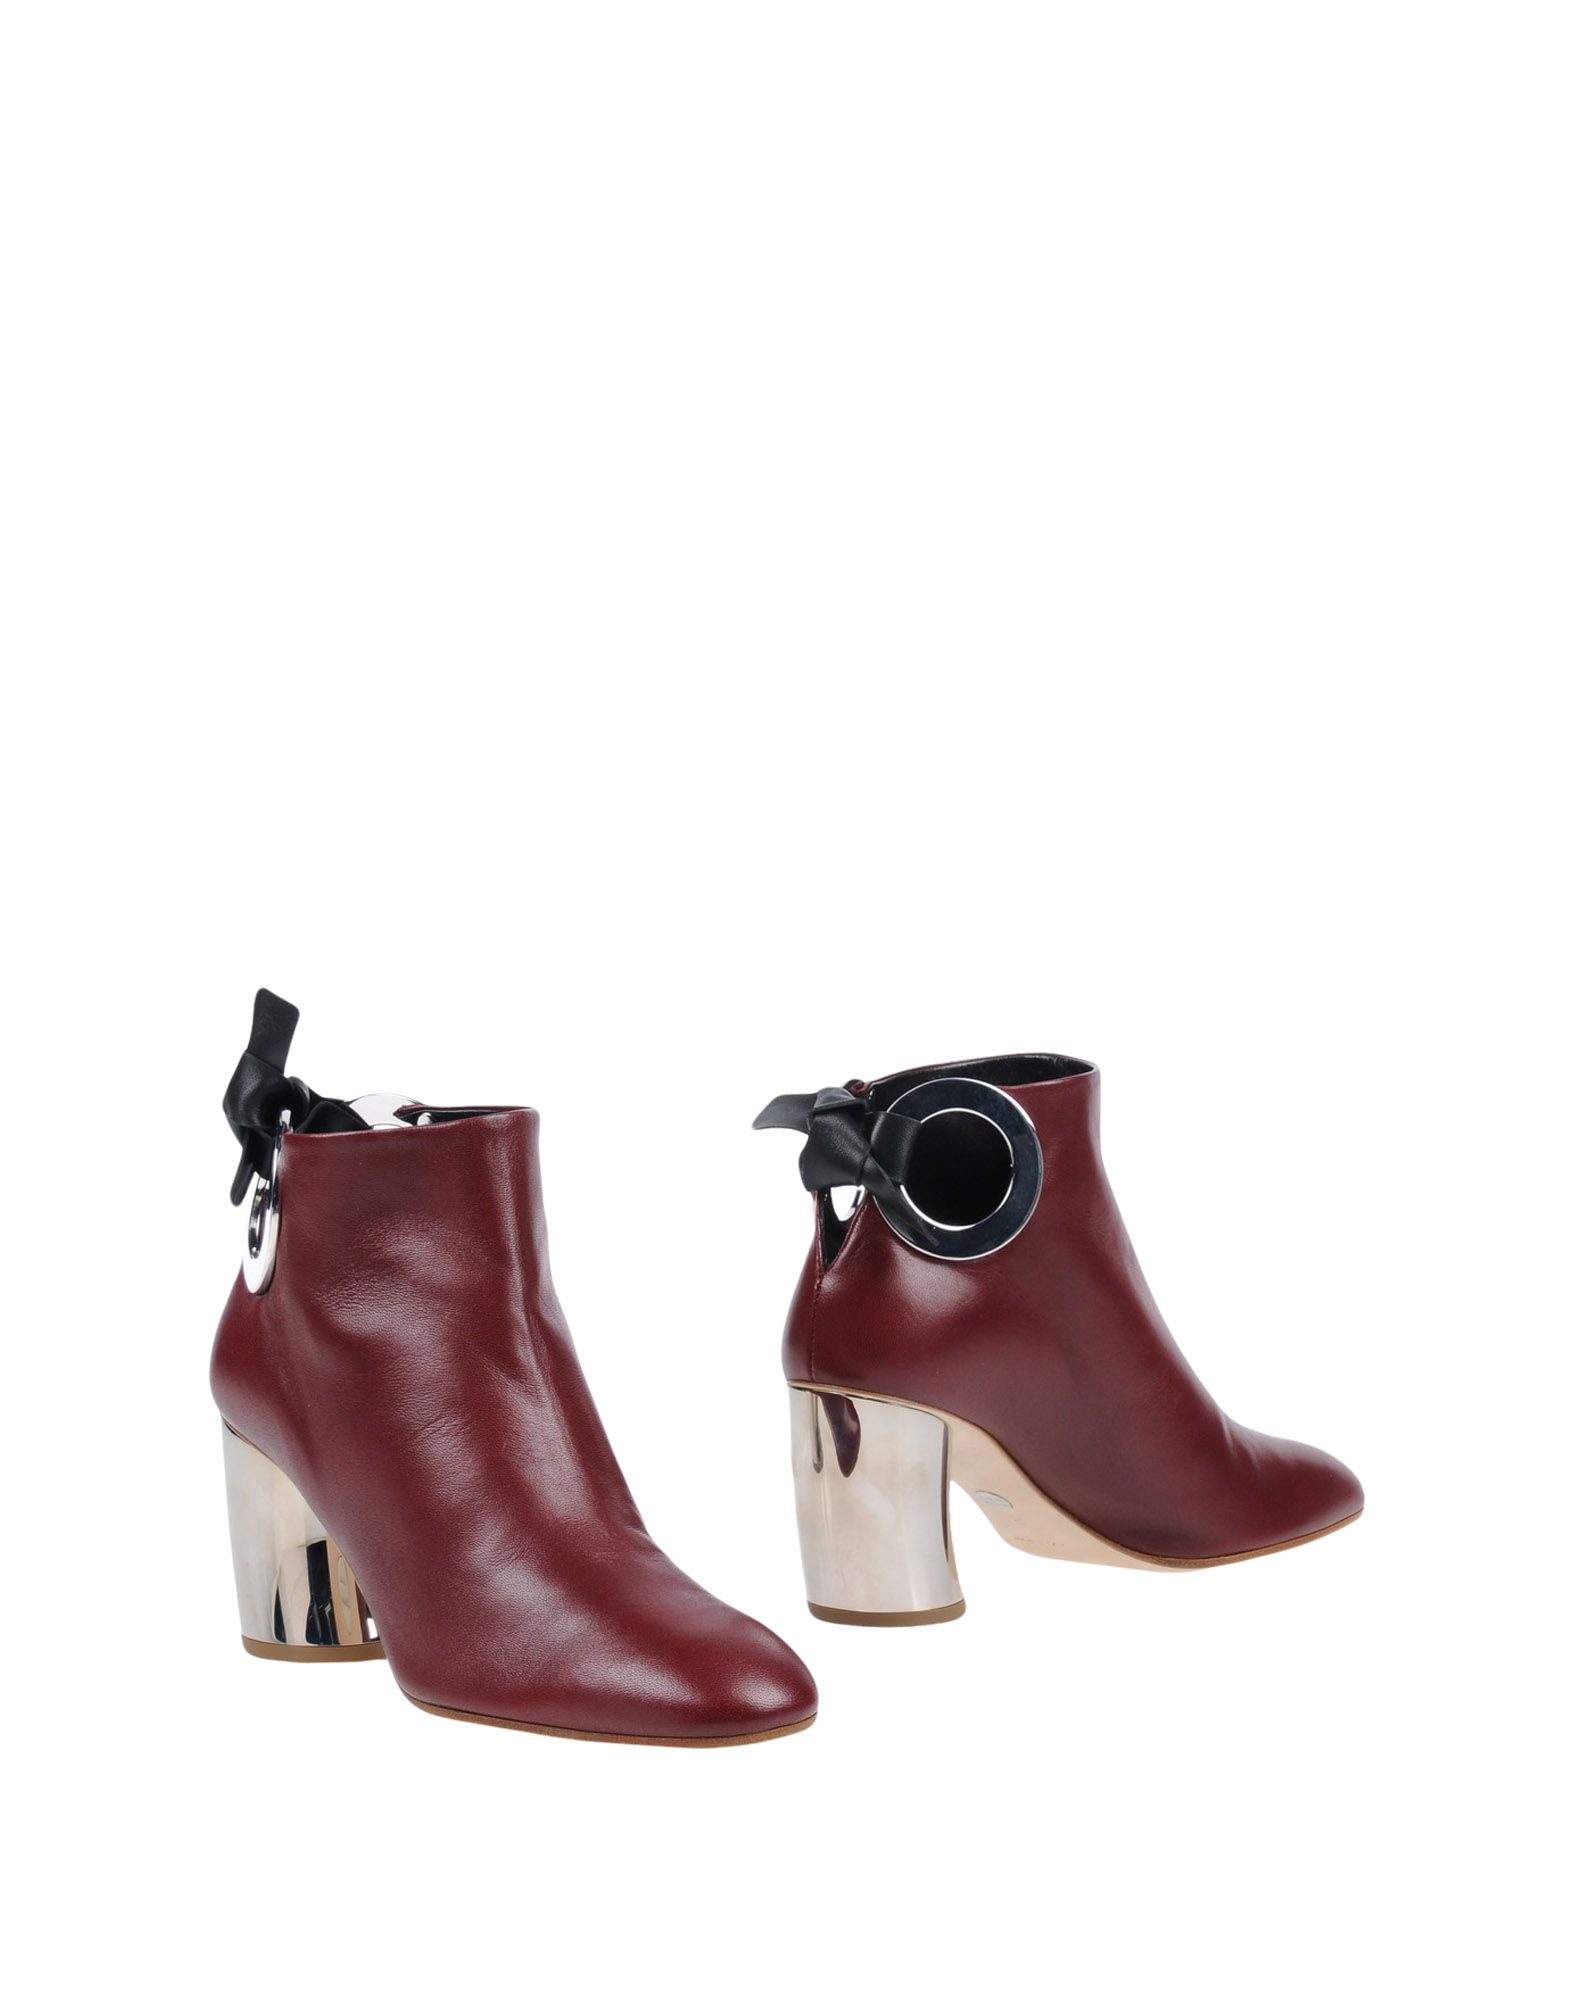 Proenza Schouler Stiefelette Damen Schuhe  11455702UQGünstige gut aussehende Schuhe Damen 9c38ae